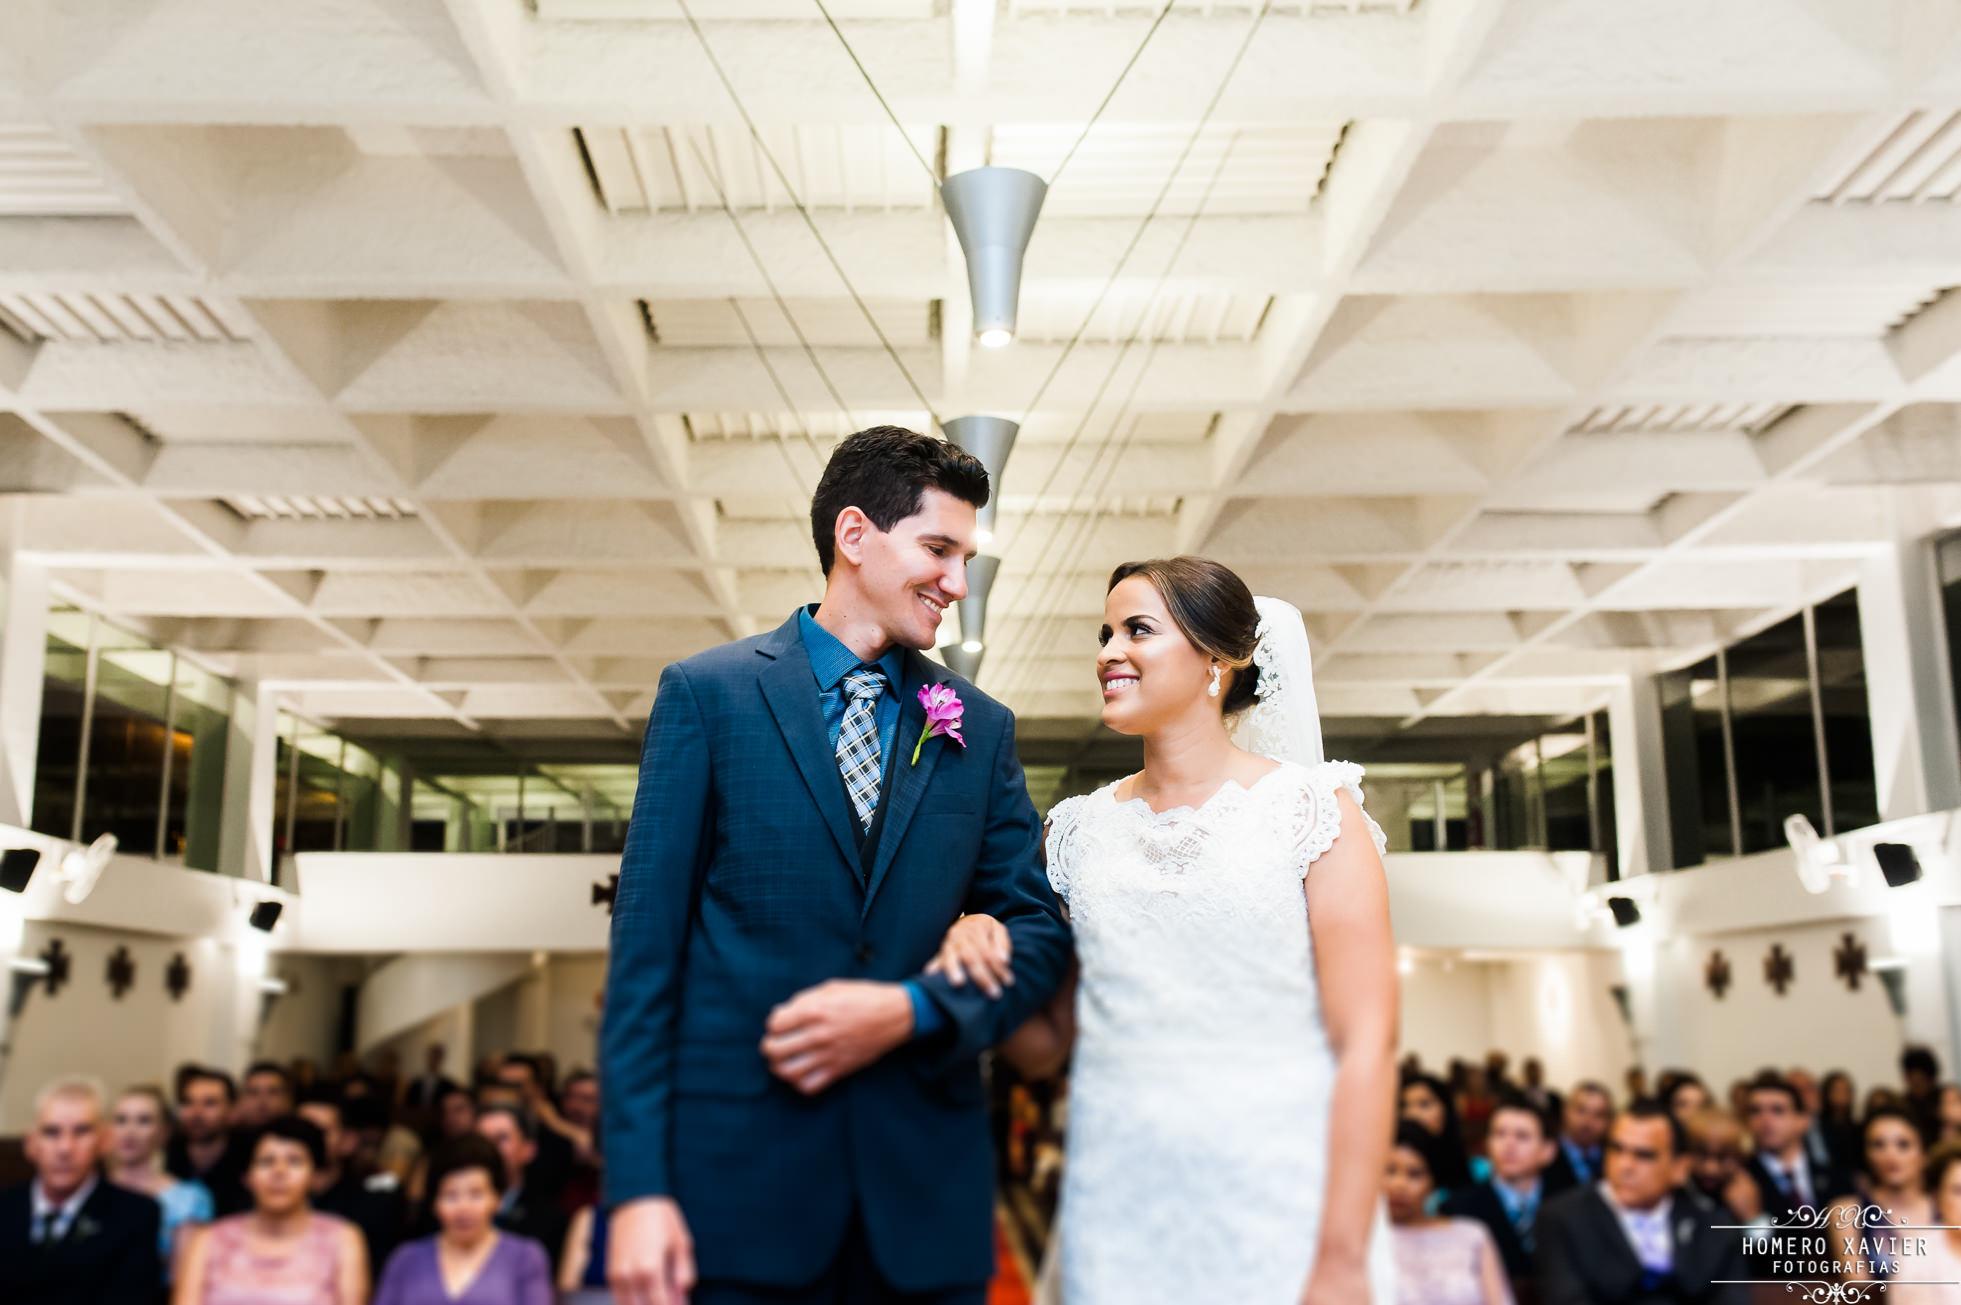 foto casamento Igreja Santo Inacio Loyola em BH